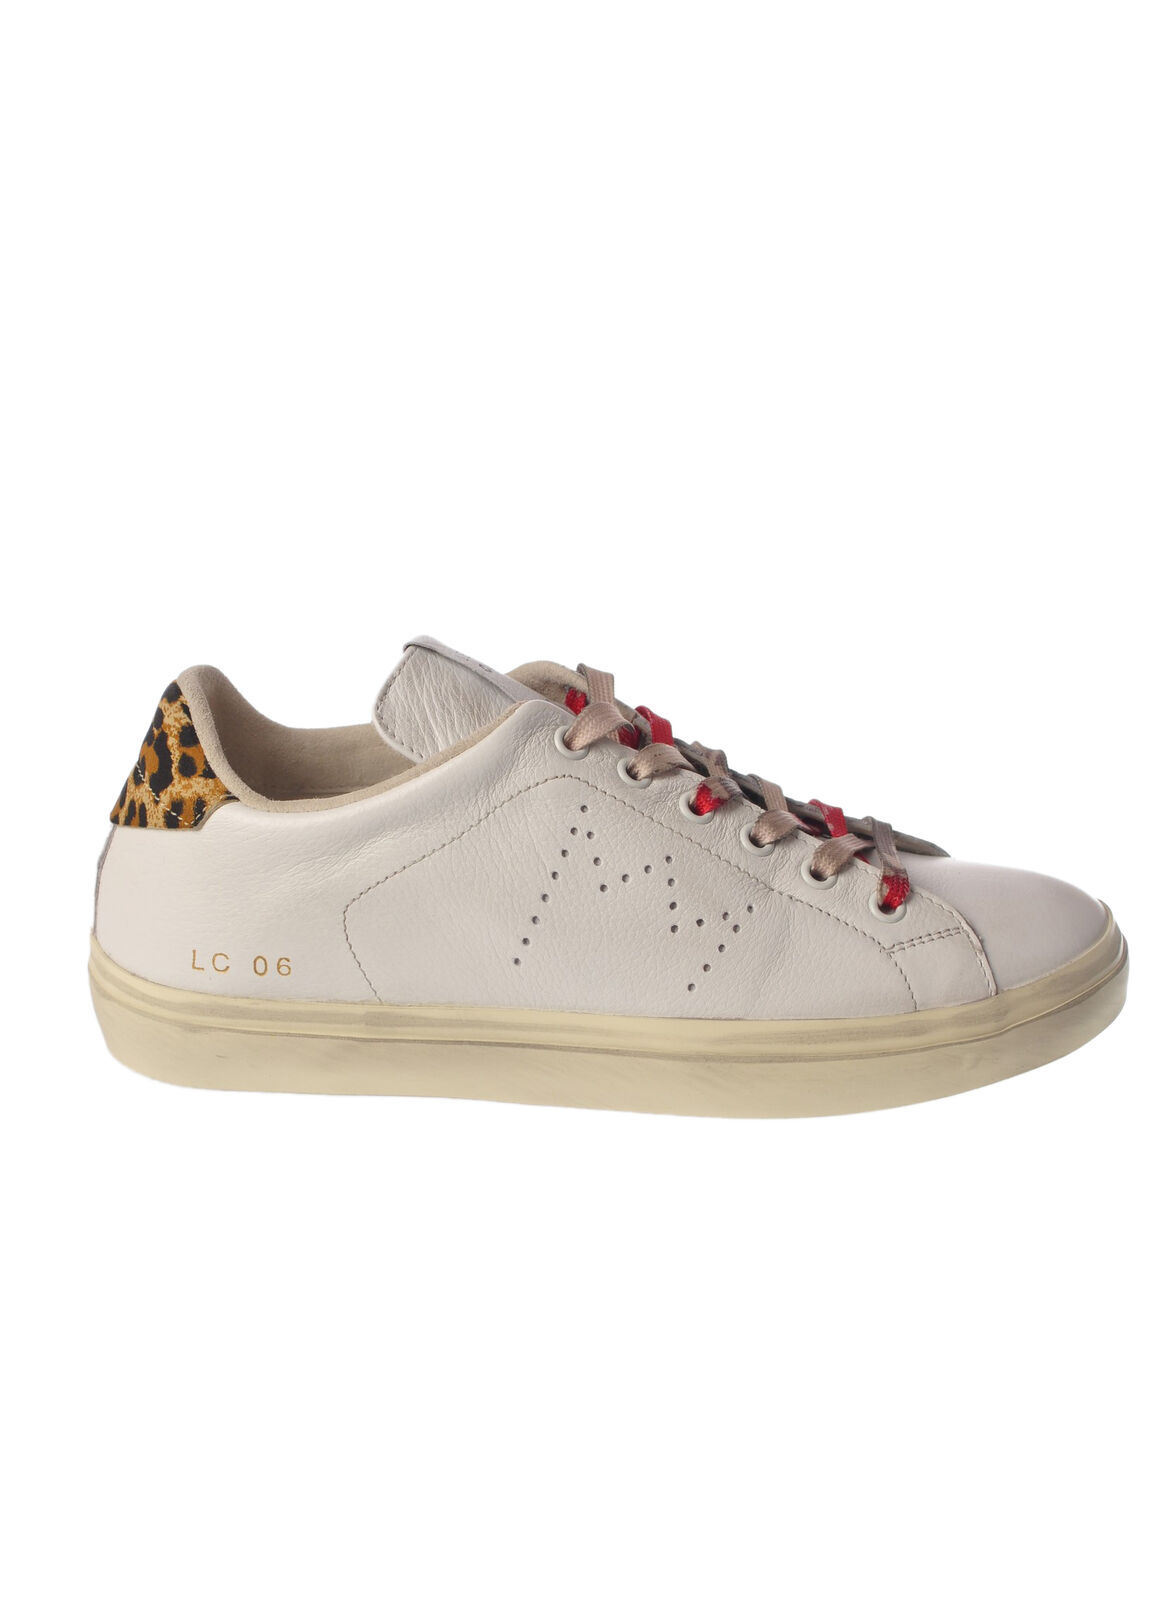 Leather Crown - Schuhe-Turnschuhe-niedrige - Frau - Weiß - 4994011D183853